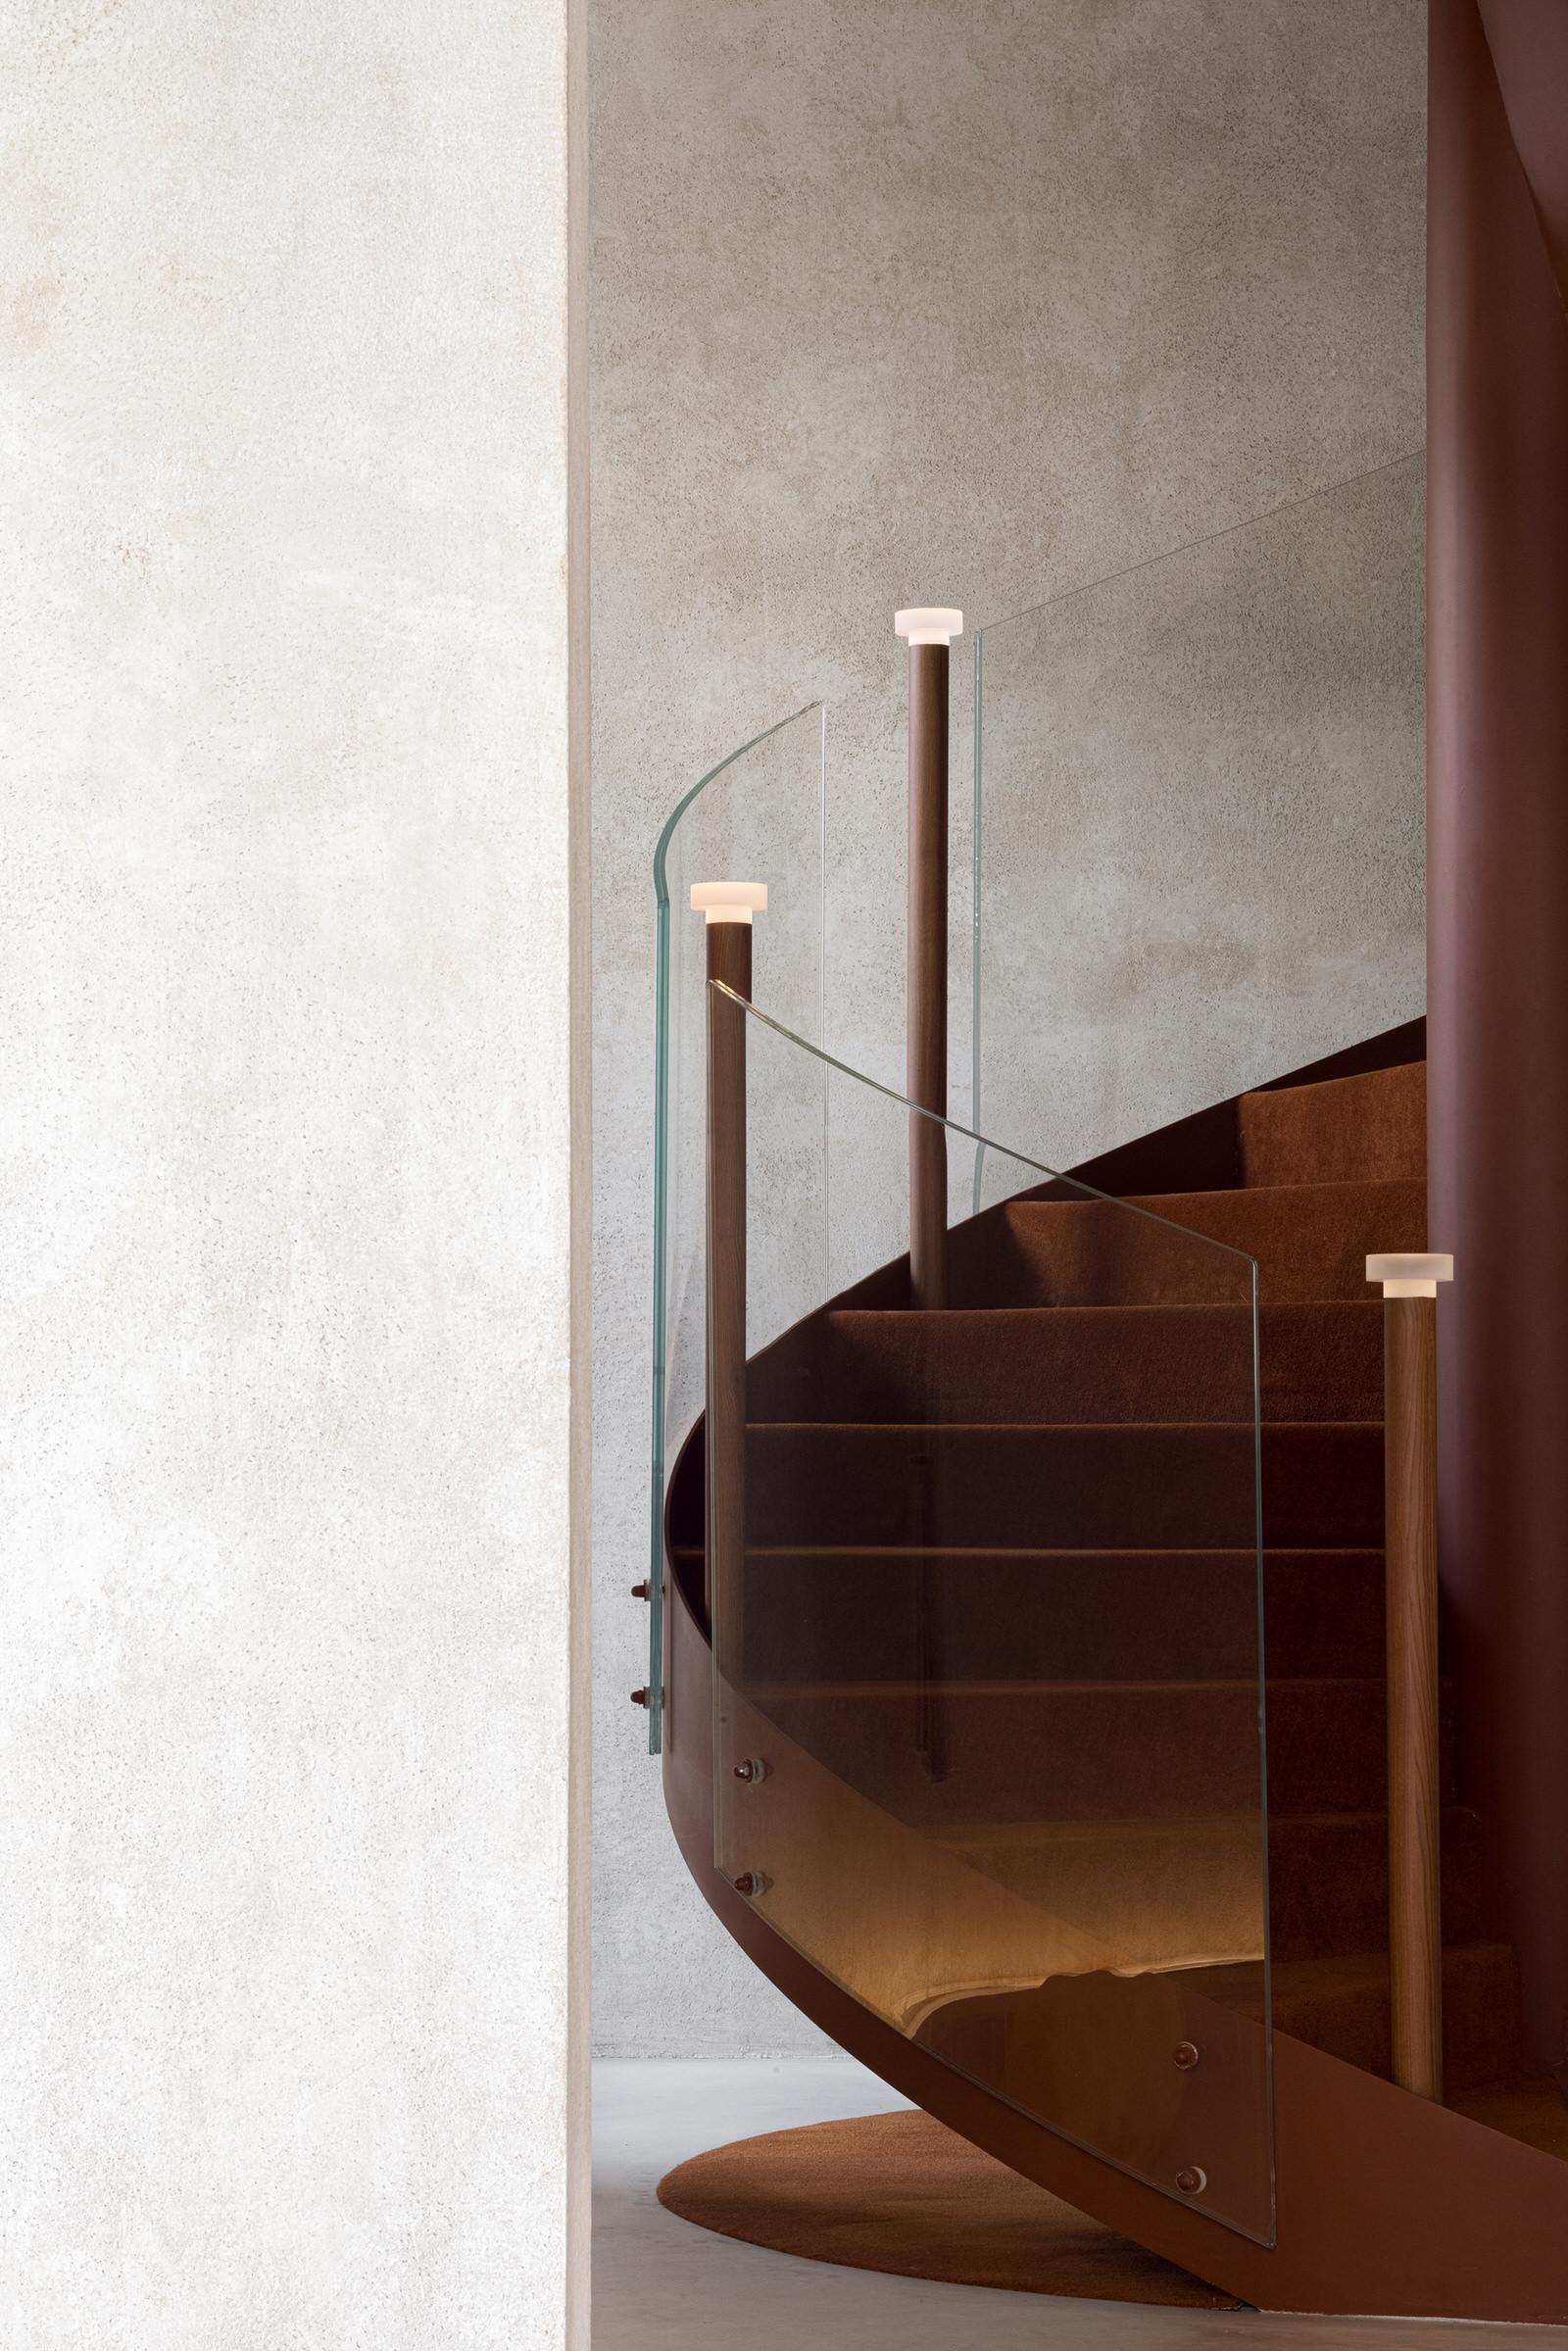 Liang Architecture Studio Audrey Boutique Hangzhou China Luxury Retail Photo Shao Feng Yellowtrace 05